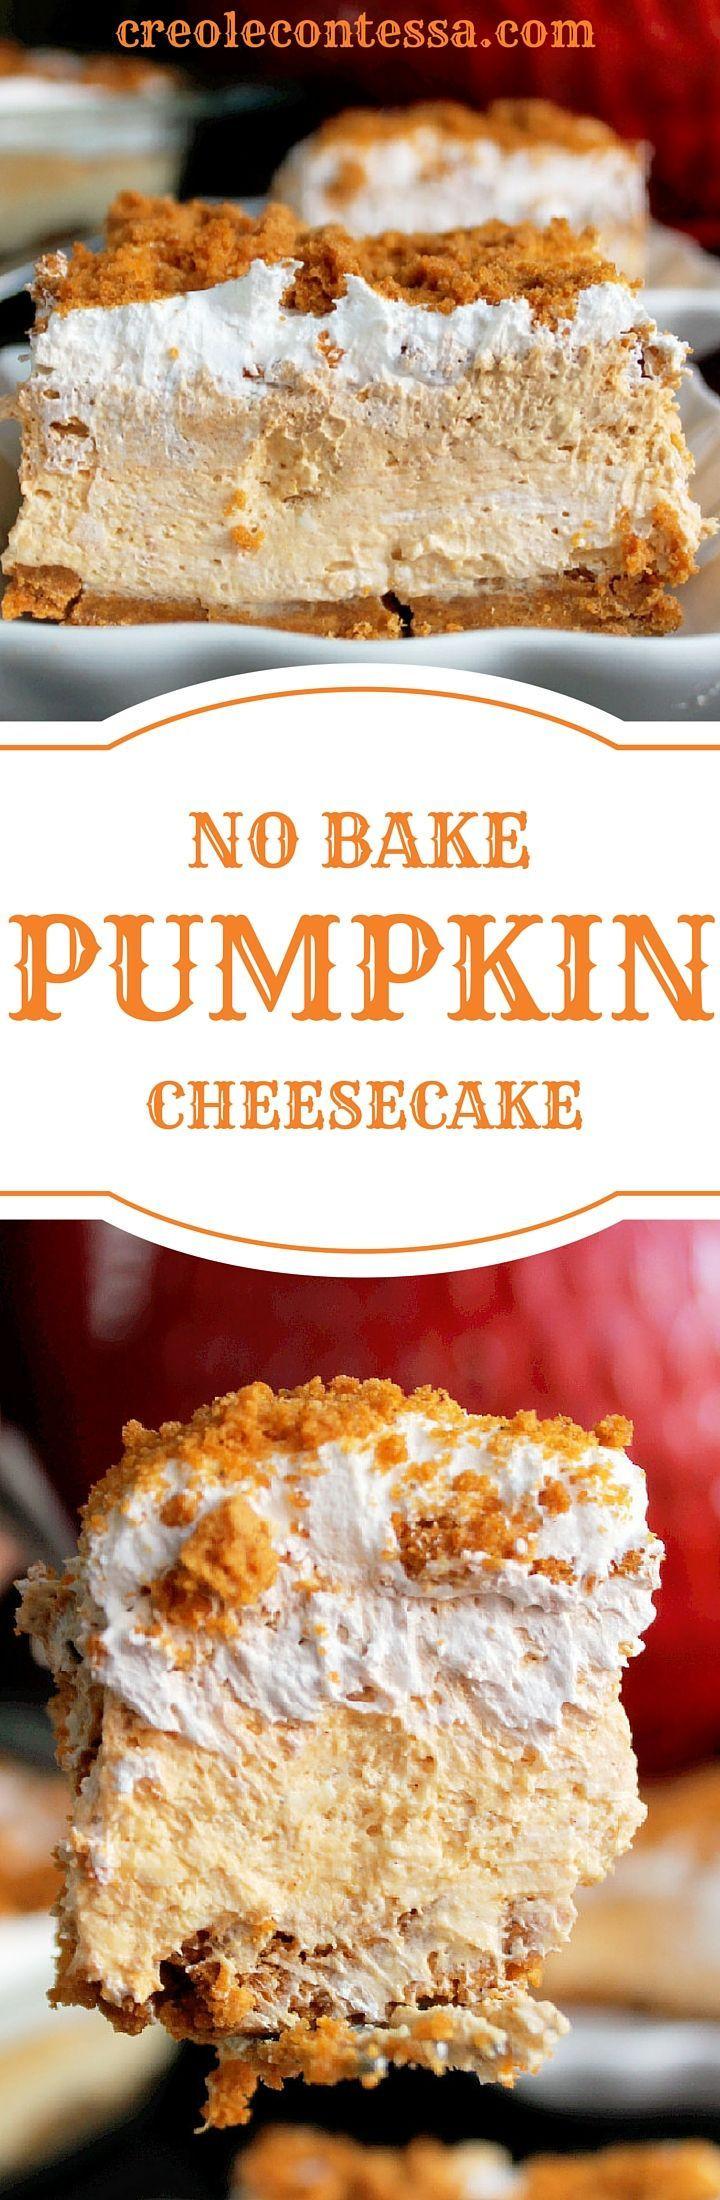 No Bake Fall Desserts  No Bake Pumpkin Cheesecake Lasagna Creole Contessa